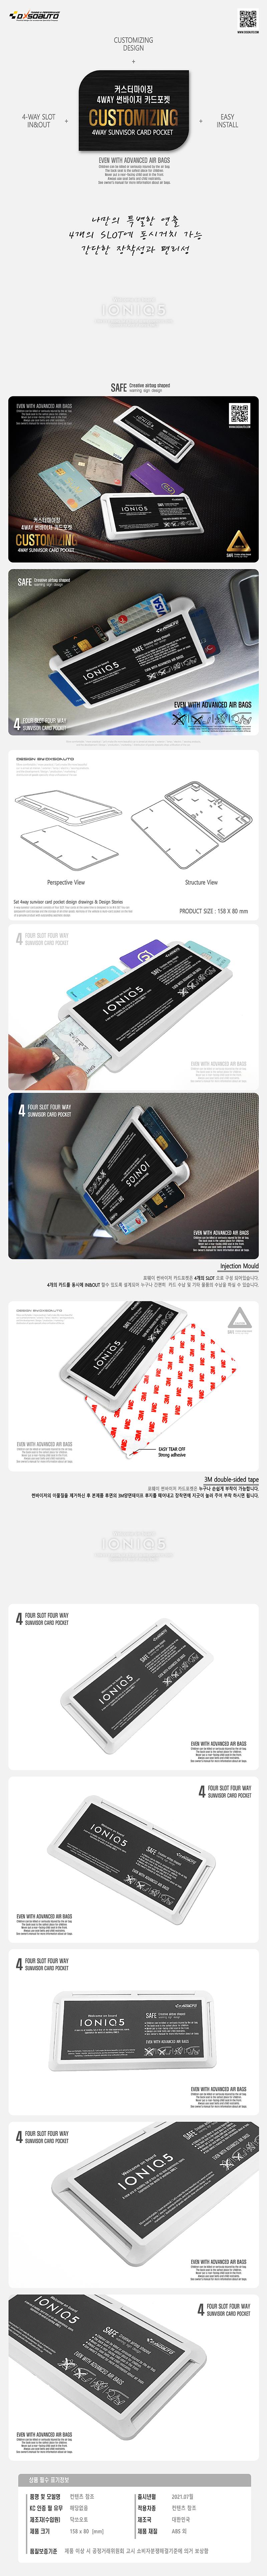 [DXSOAUTO] 커스터마이징 4WAY 썬바이저 카드포켓 (1EA / 1SET) 아이오닉5 화이트